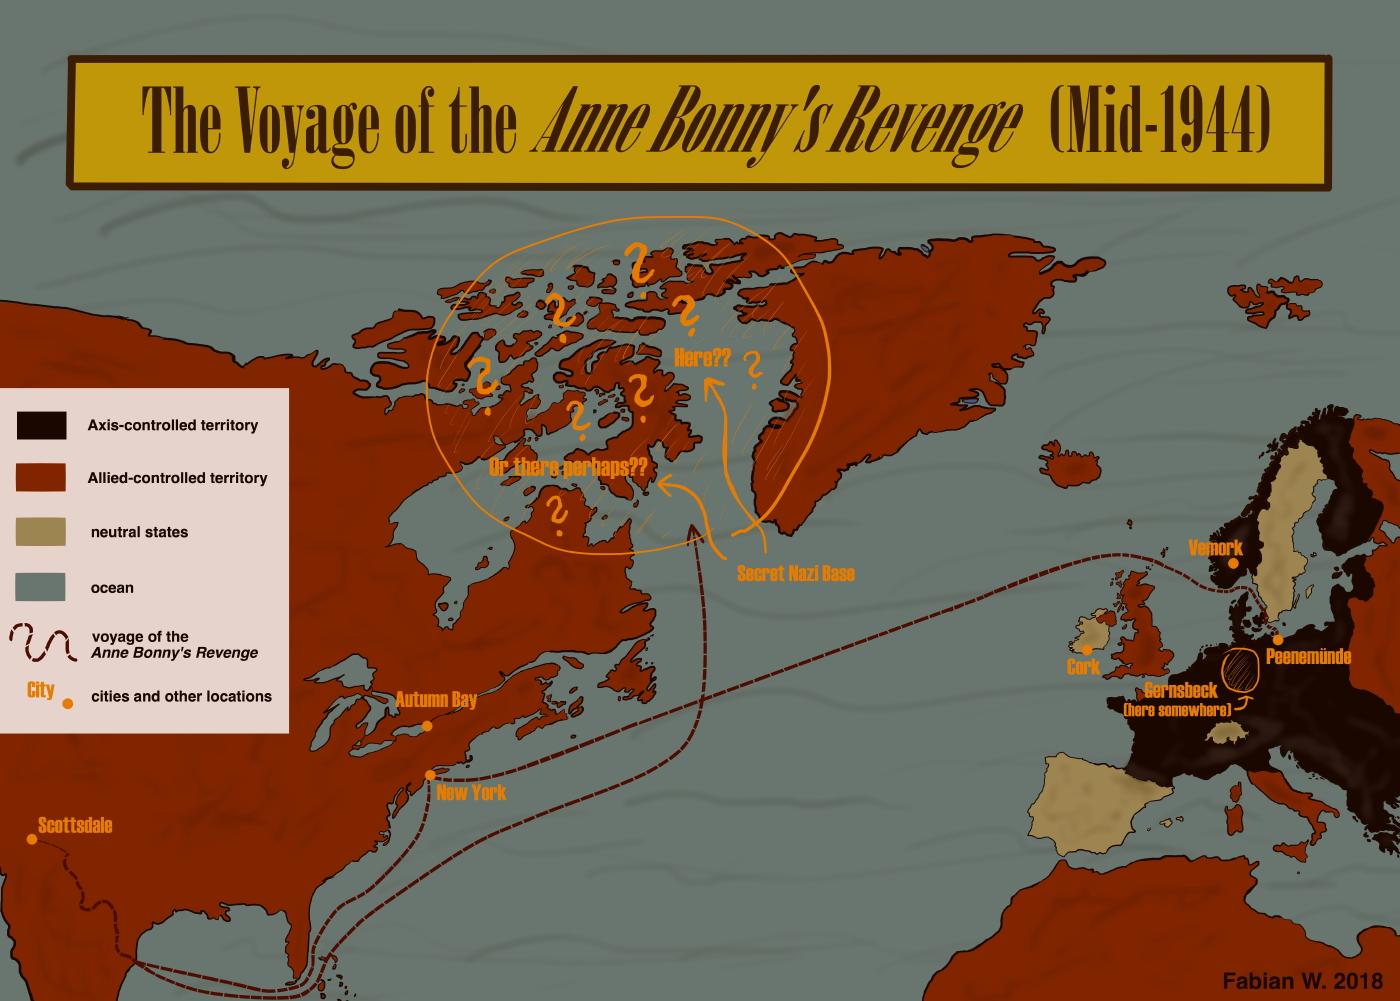 The Voyage of the Anne Bonny's Revenge (Mid-1944)